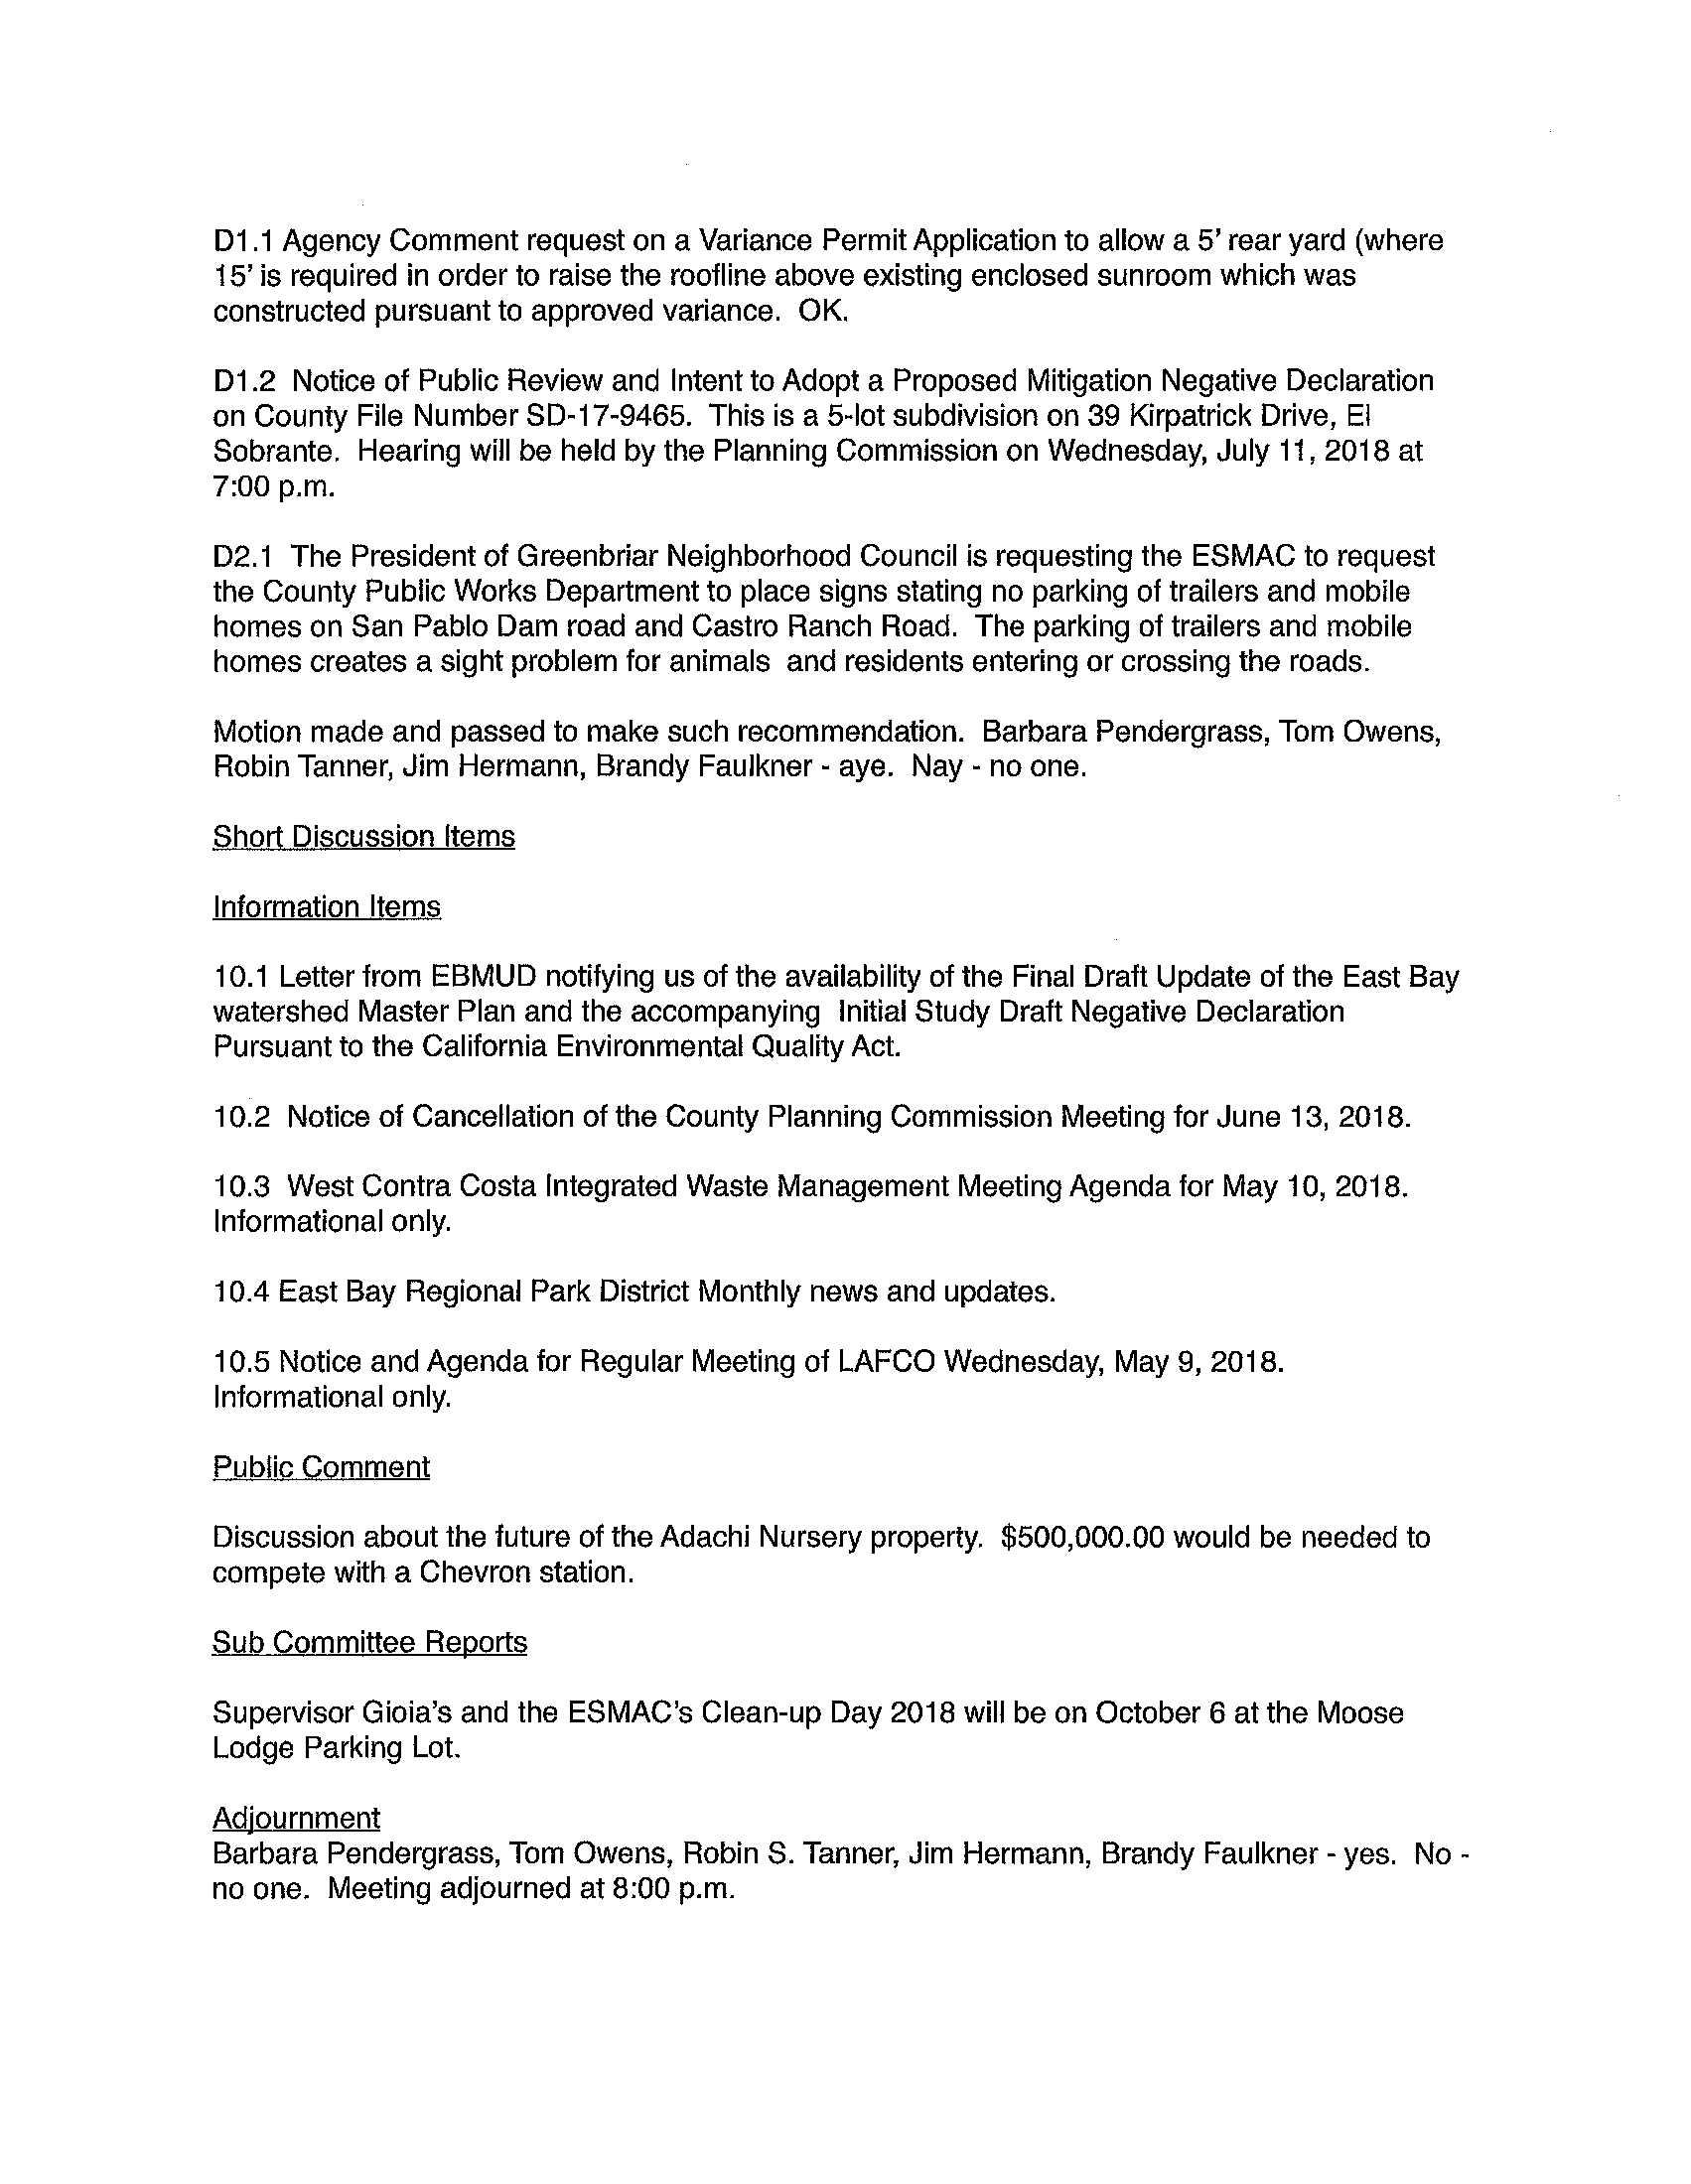 ESMAC Agenda 7.11.2018 (36 Pages)_6.jpg